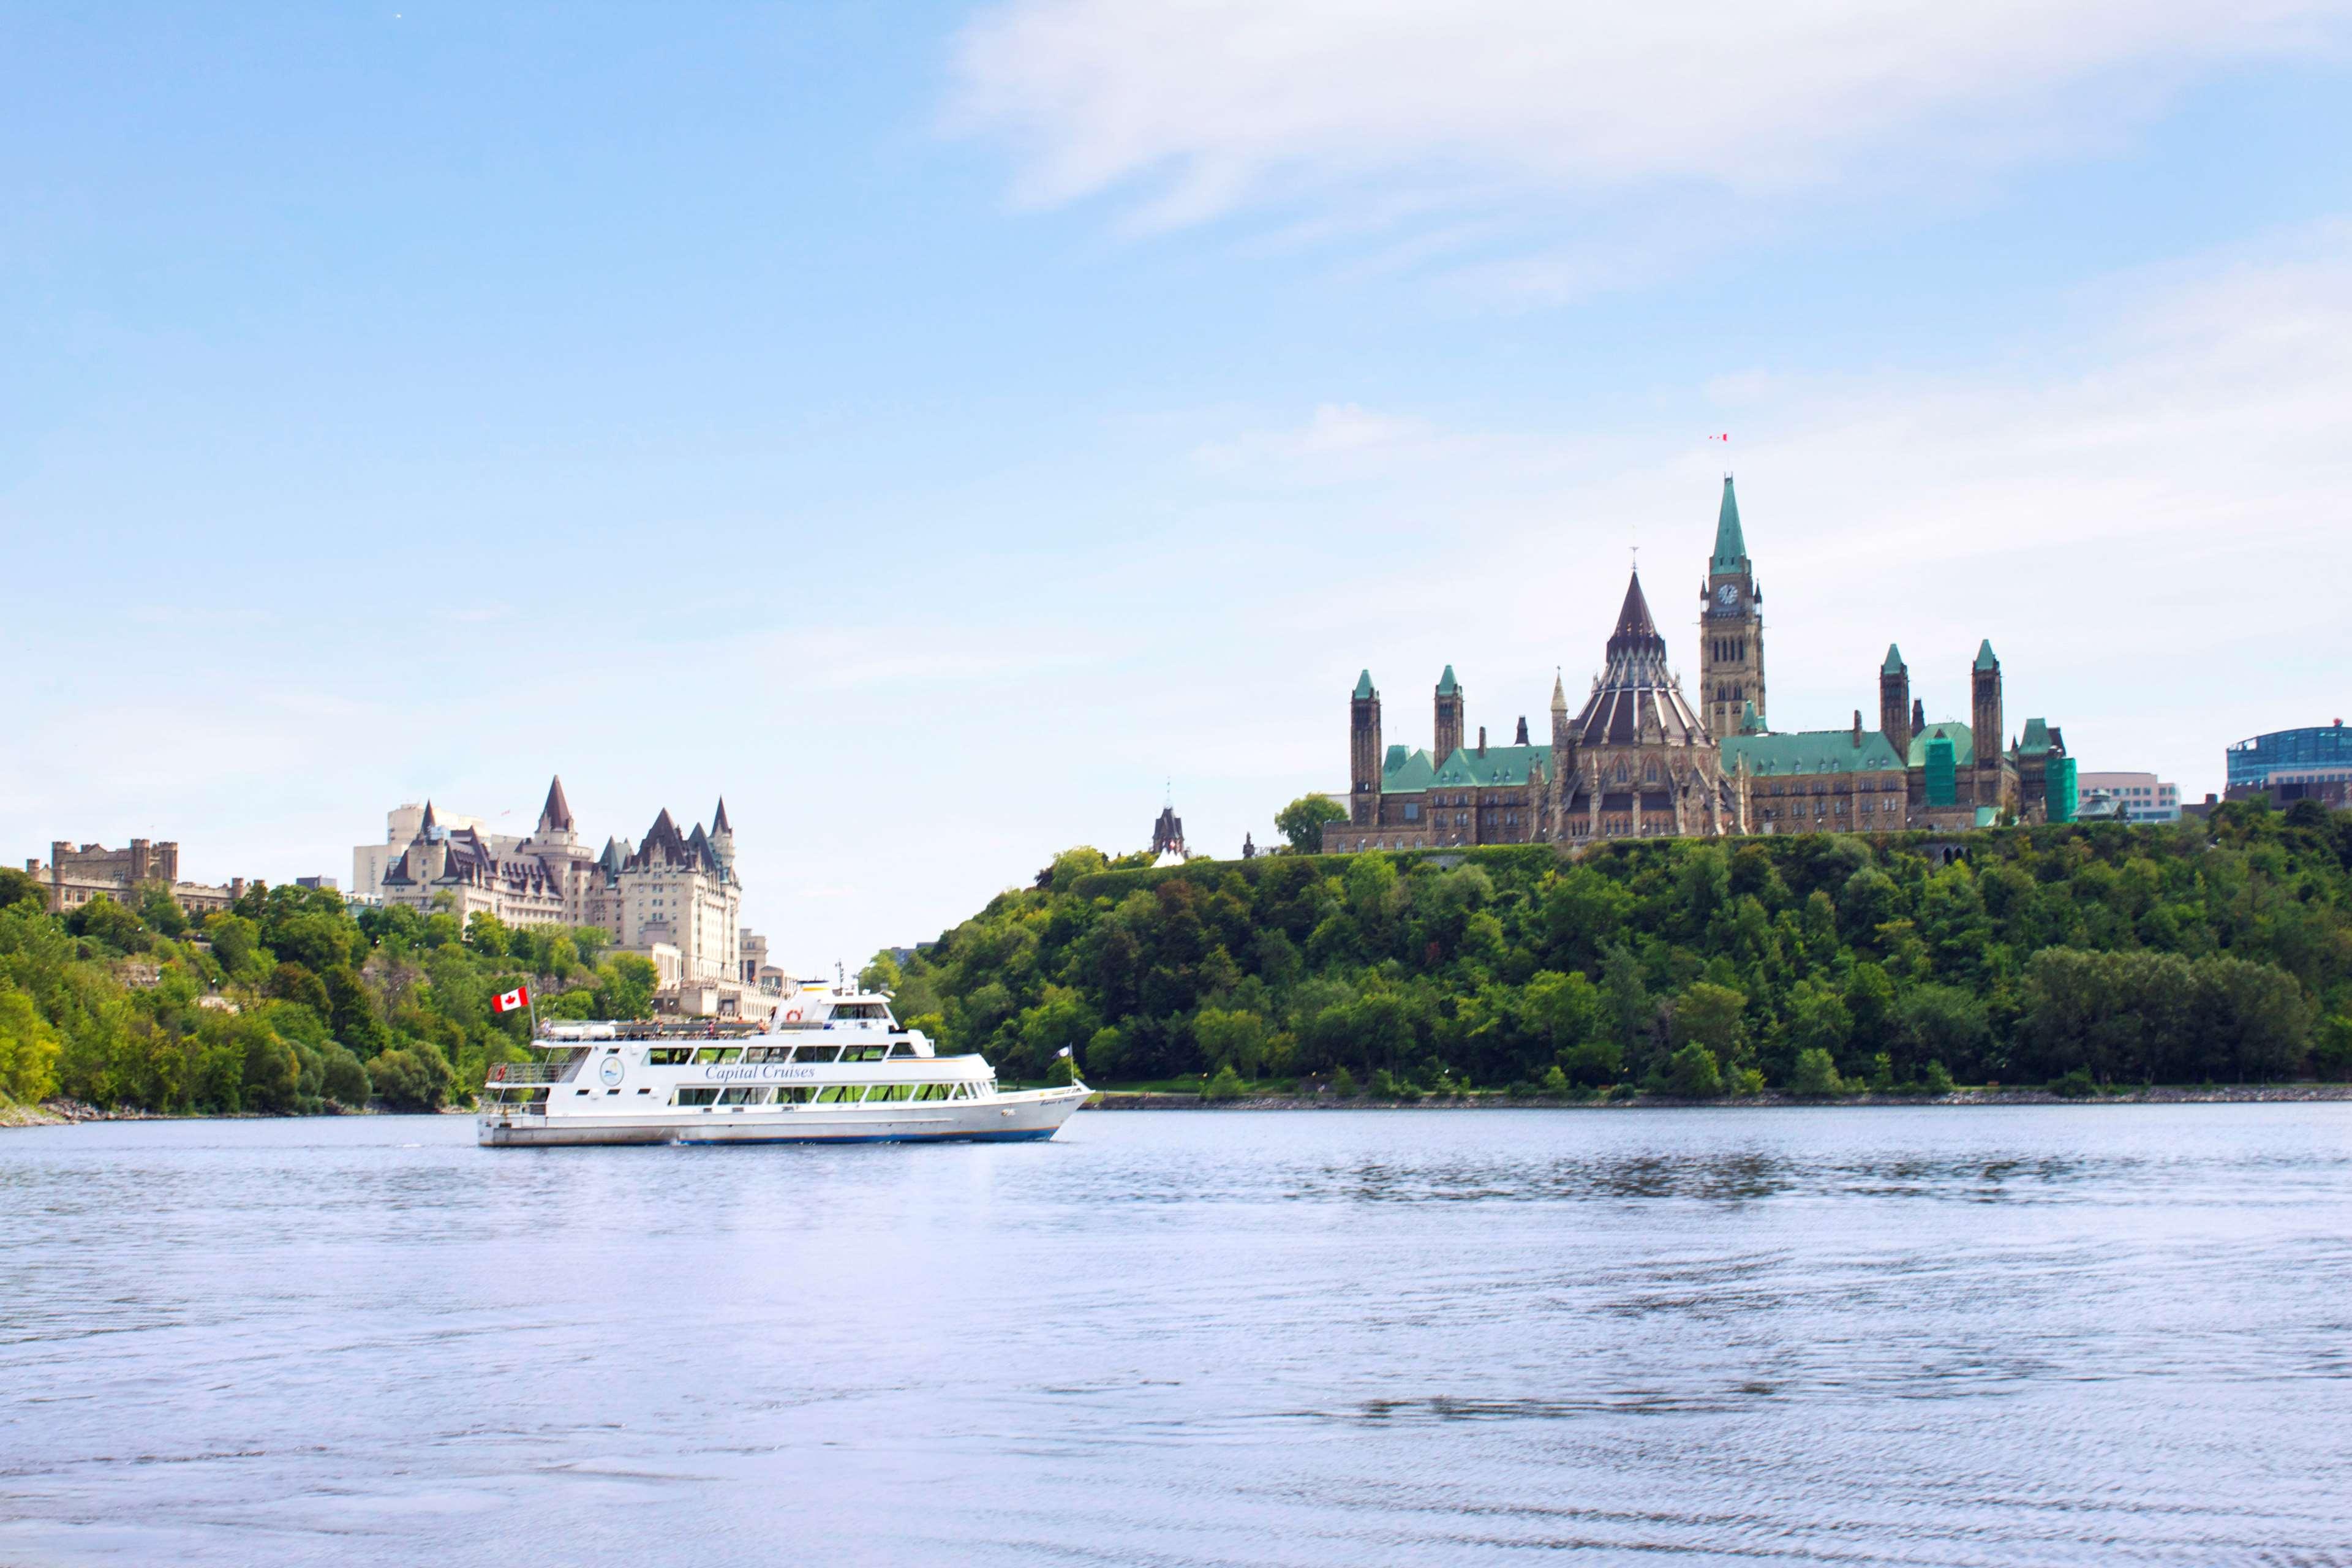 Four Points by Sheraton Hotel & Conference Centre Gatineau-Ottawa à Gatineau: Cruising on the Ottawa River